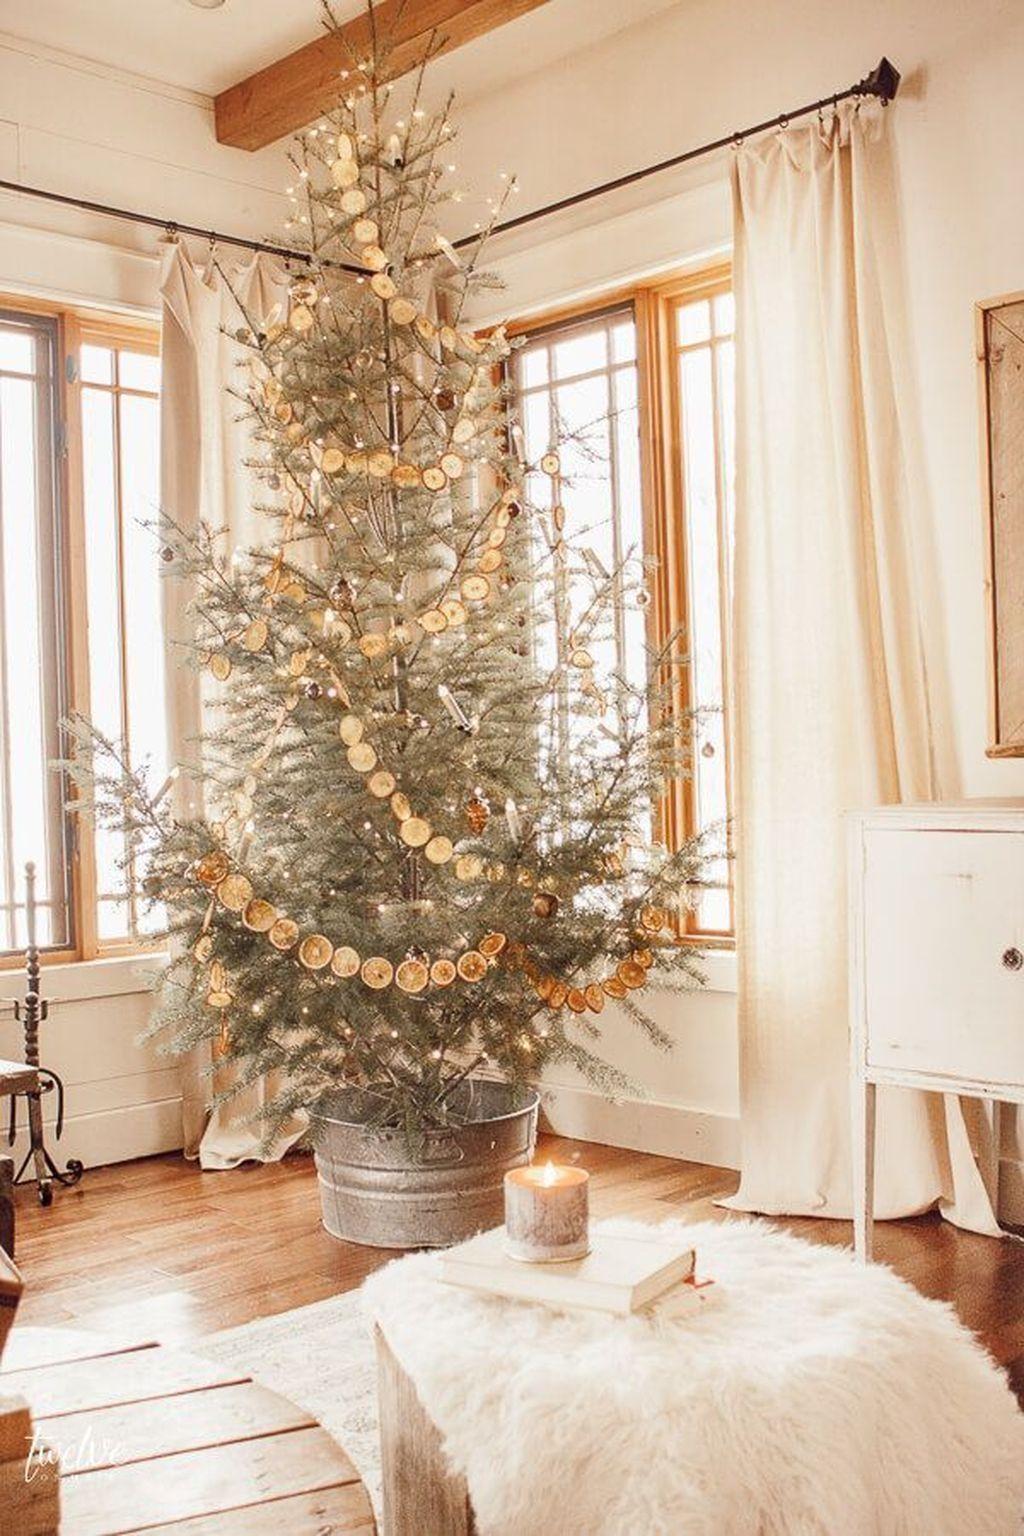 30 Pretty Scandinavian Style For Christmas Decoration Ideas Scandinavian Christmas Decorations Christmas Decorations Living Room Simple Christmas Decor